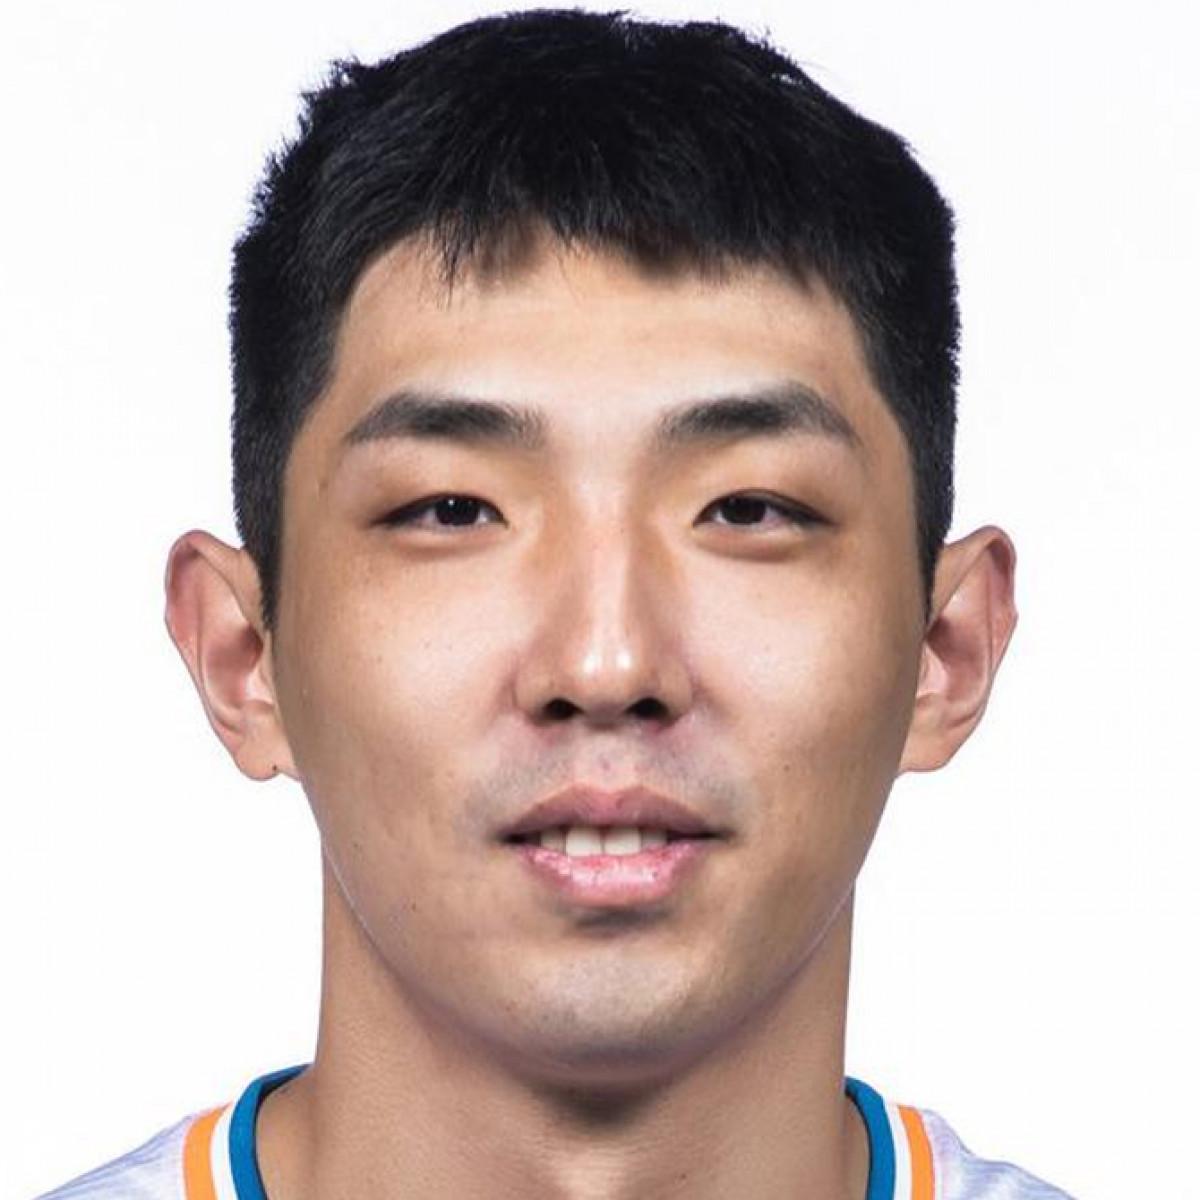 Yuanyu Li